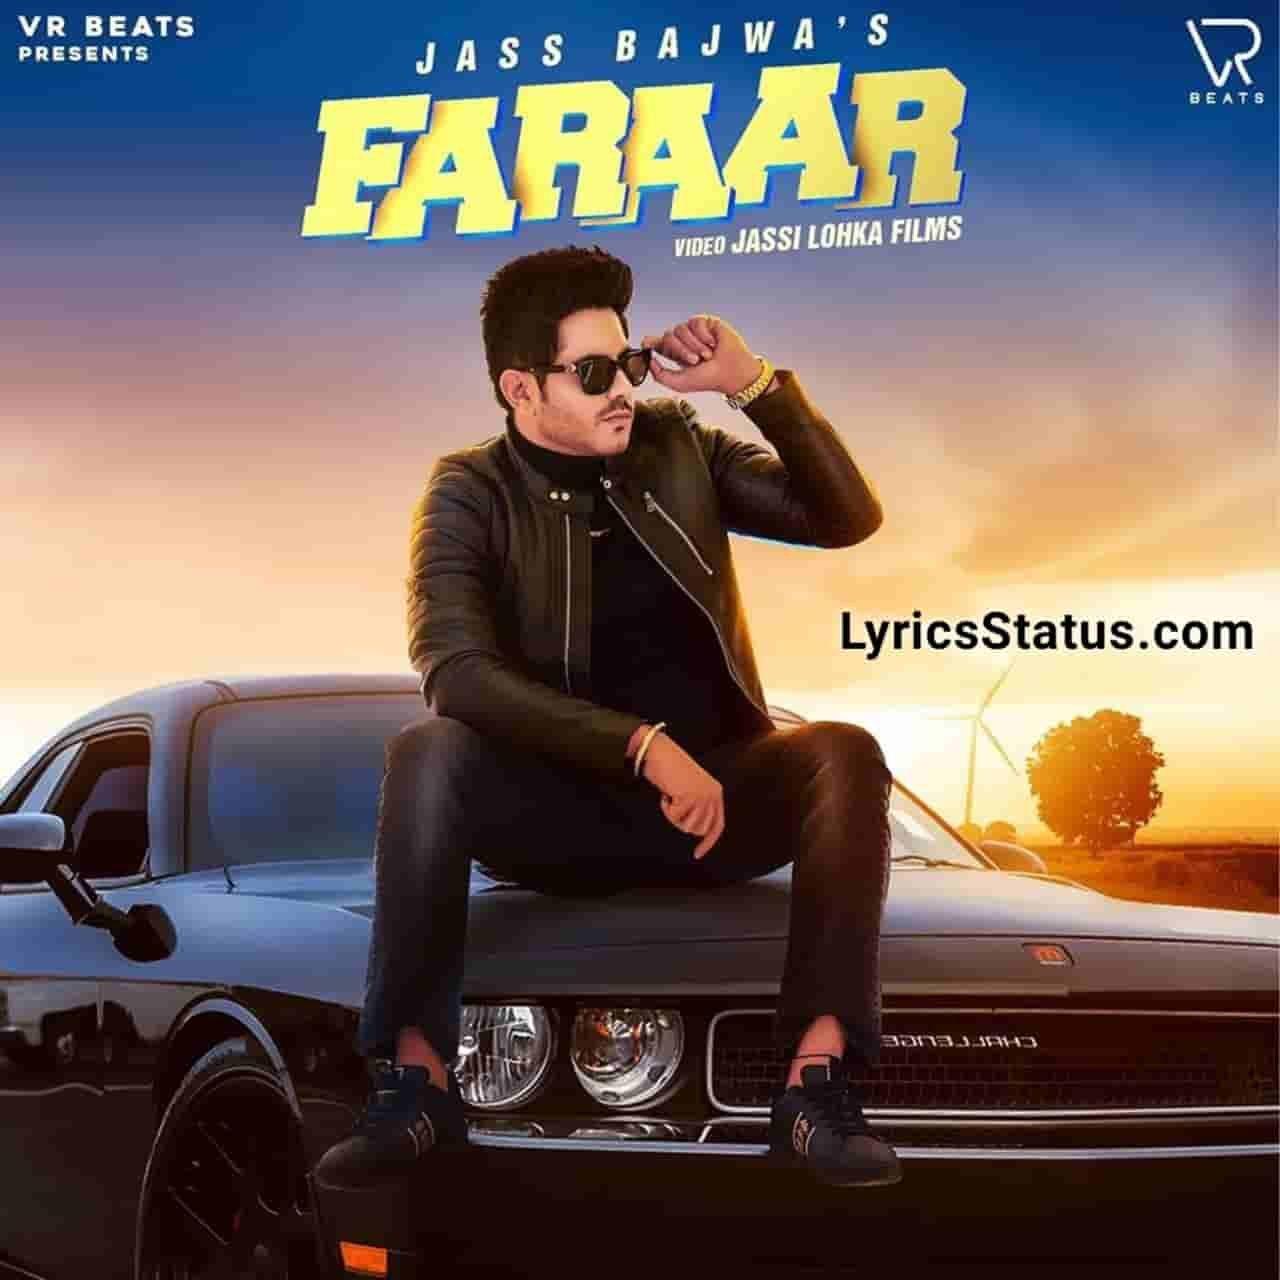 Jass Bajwa new song Faraar Lyrics status download punjabi song Gaddiyan ch yaar ne Ghar ton faraar ne Bande dildaar ne Jo baithe sade naal ni